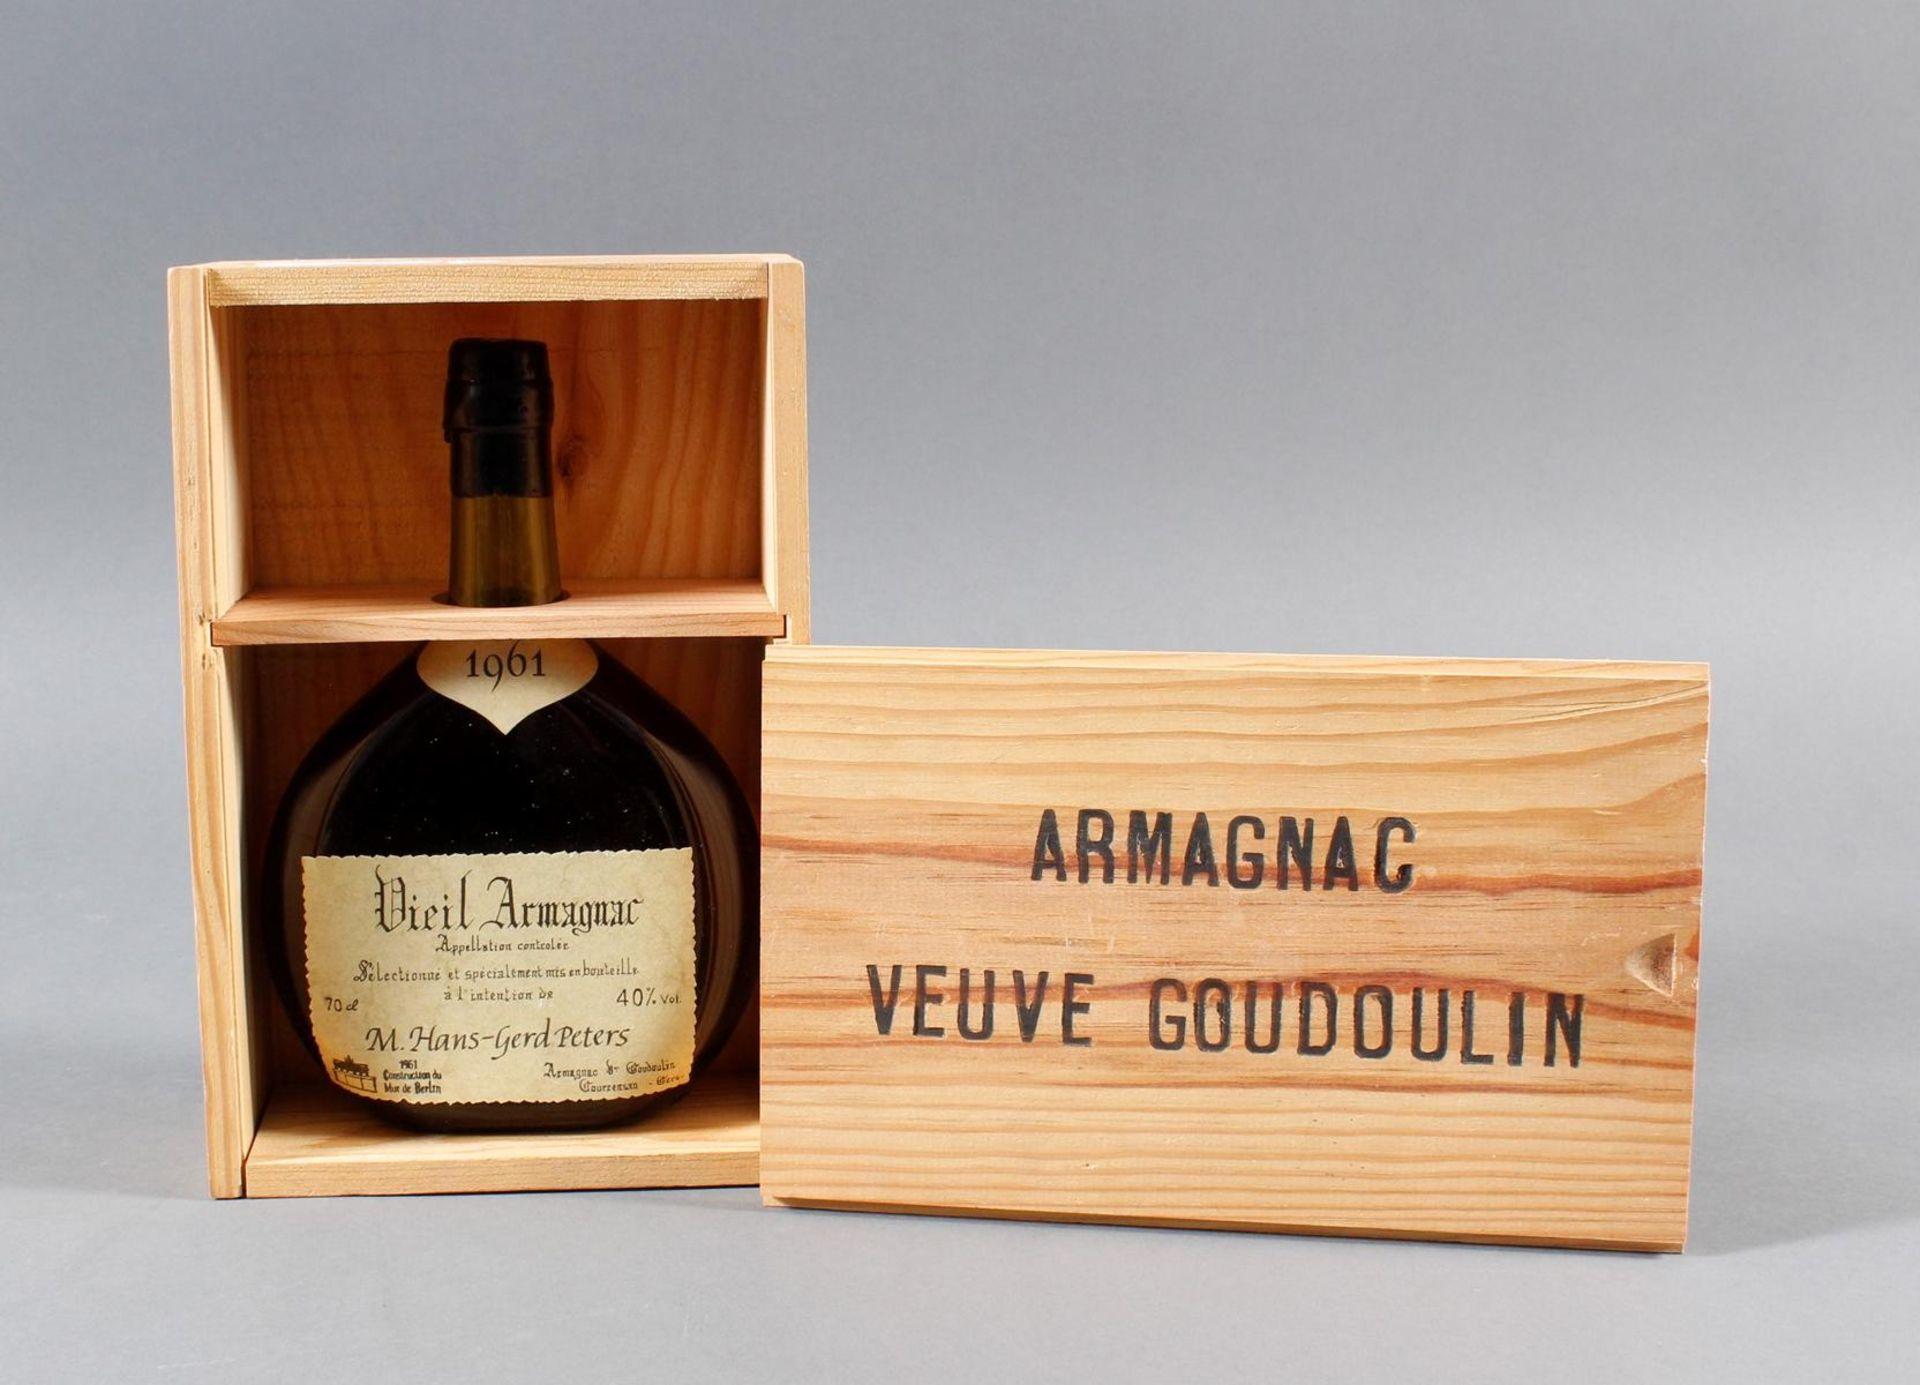 Armagnac de Goudoulin, 1961